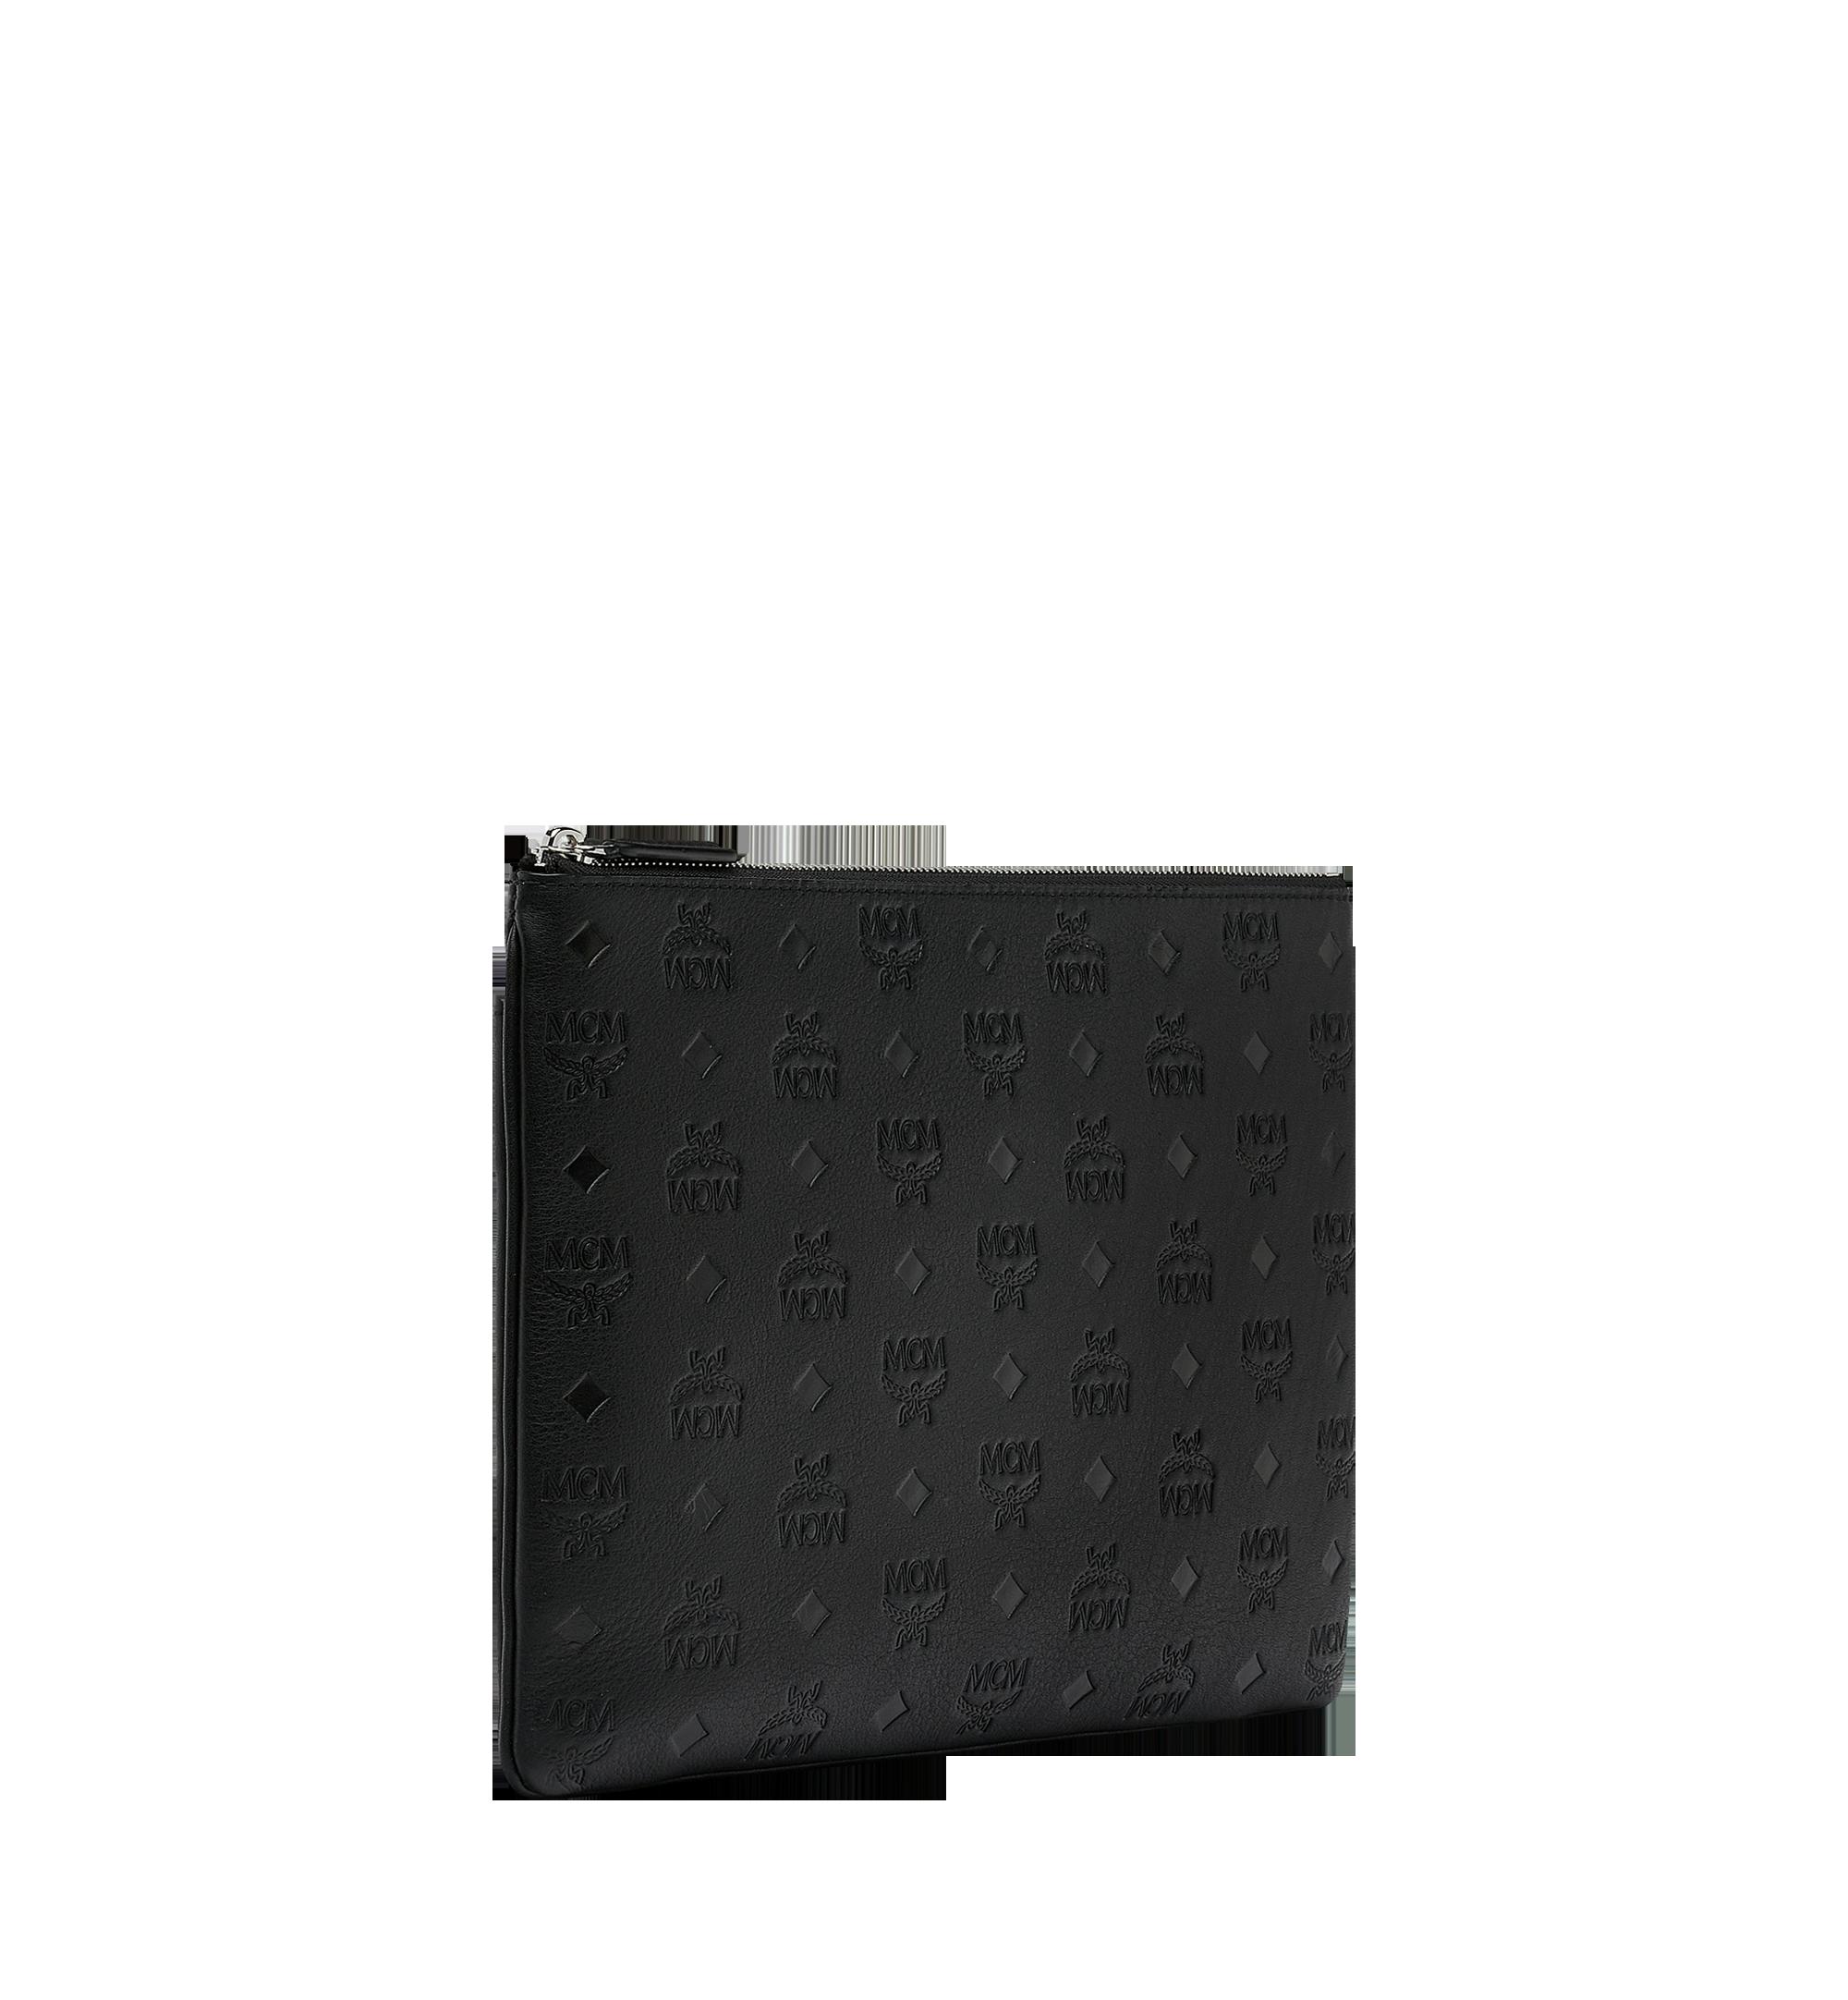 MCM Crossbody Pouch in Monogram Leather Black MYZ9SKM42BK001 Alternate View 2